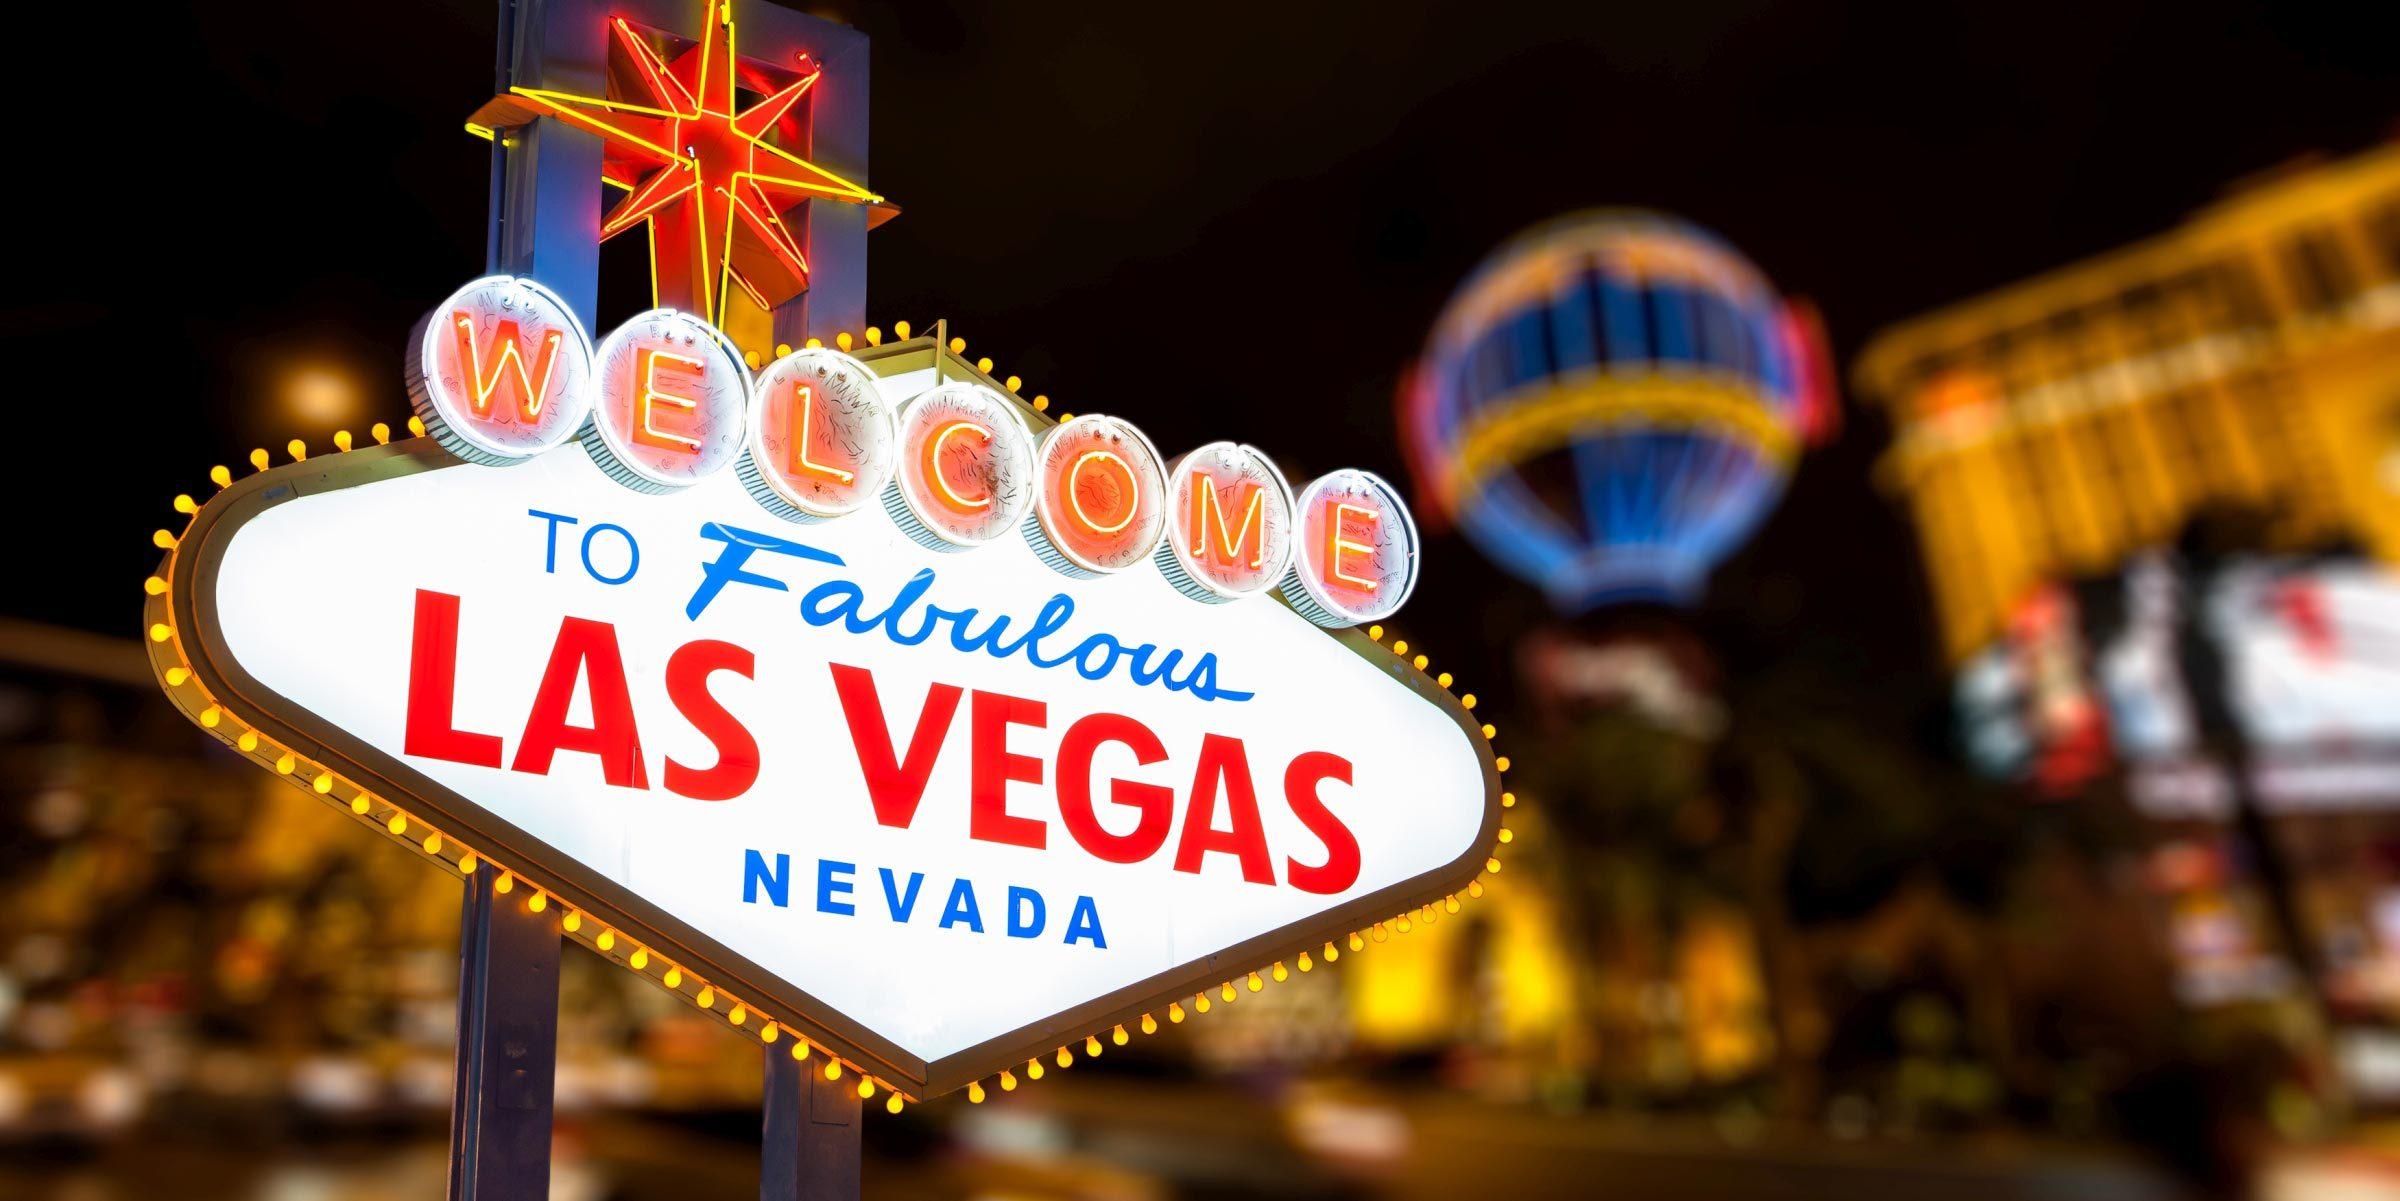 Das berühmte Schild von Las Vegas